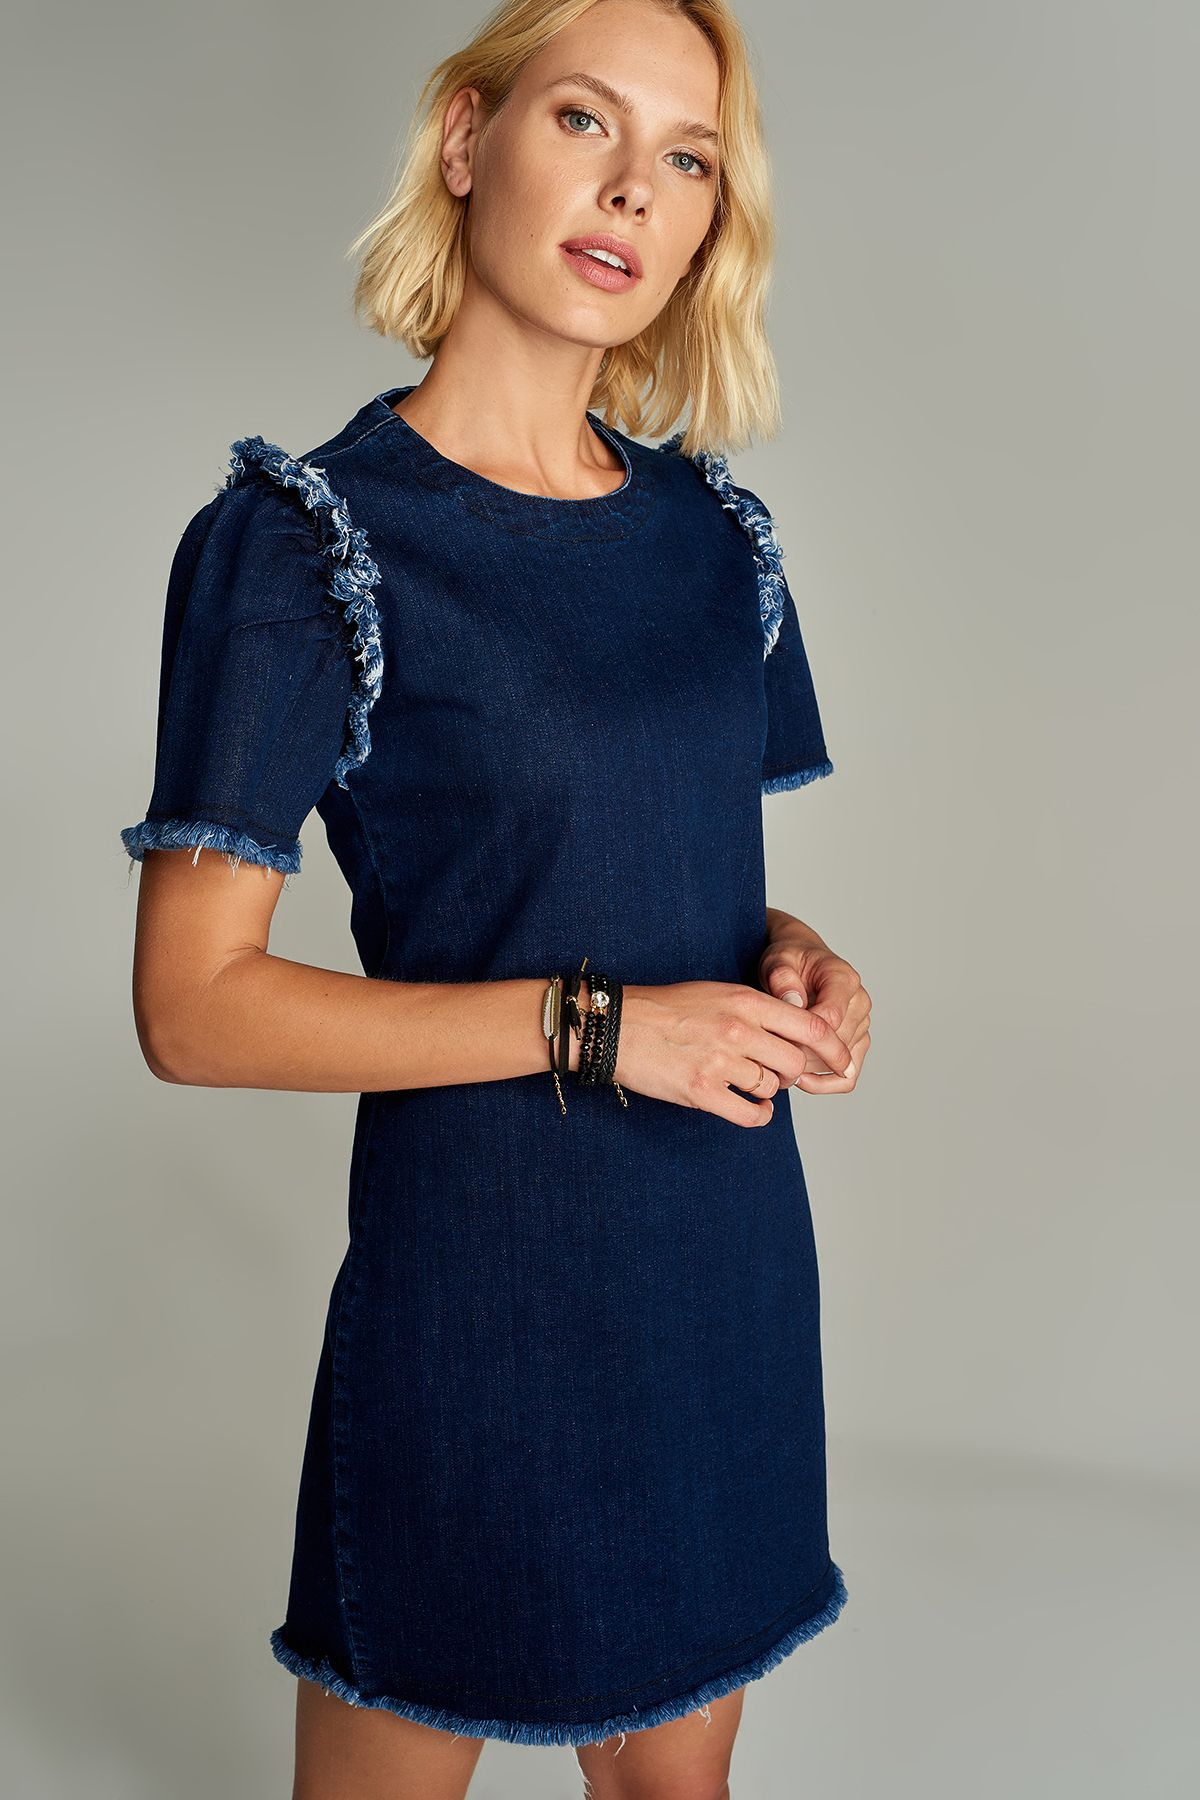 Koyu Mavi Puskul Detayli Denim Elbise Tclaw18lh0015 59 99 Tl Elbise